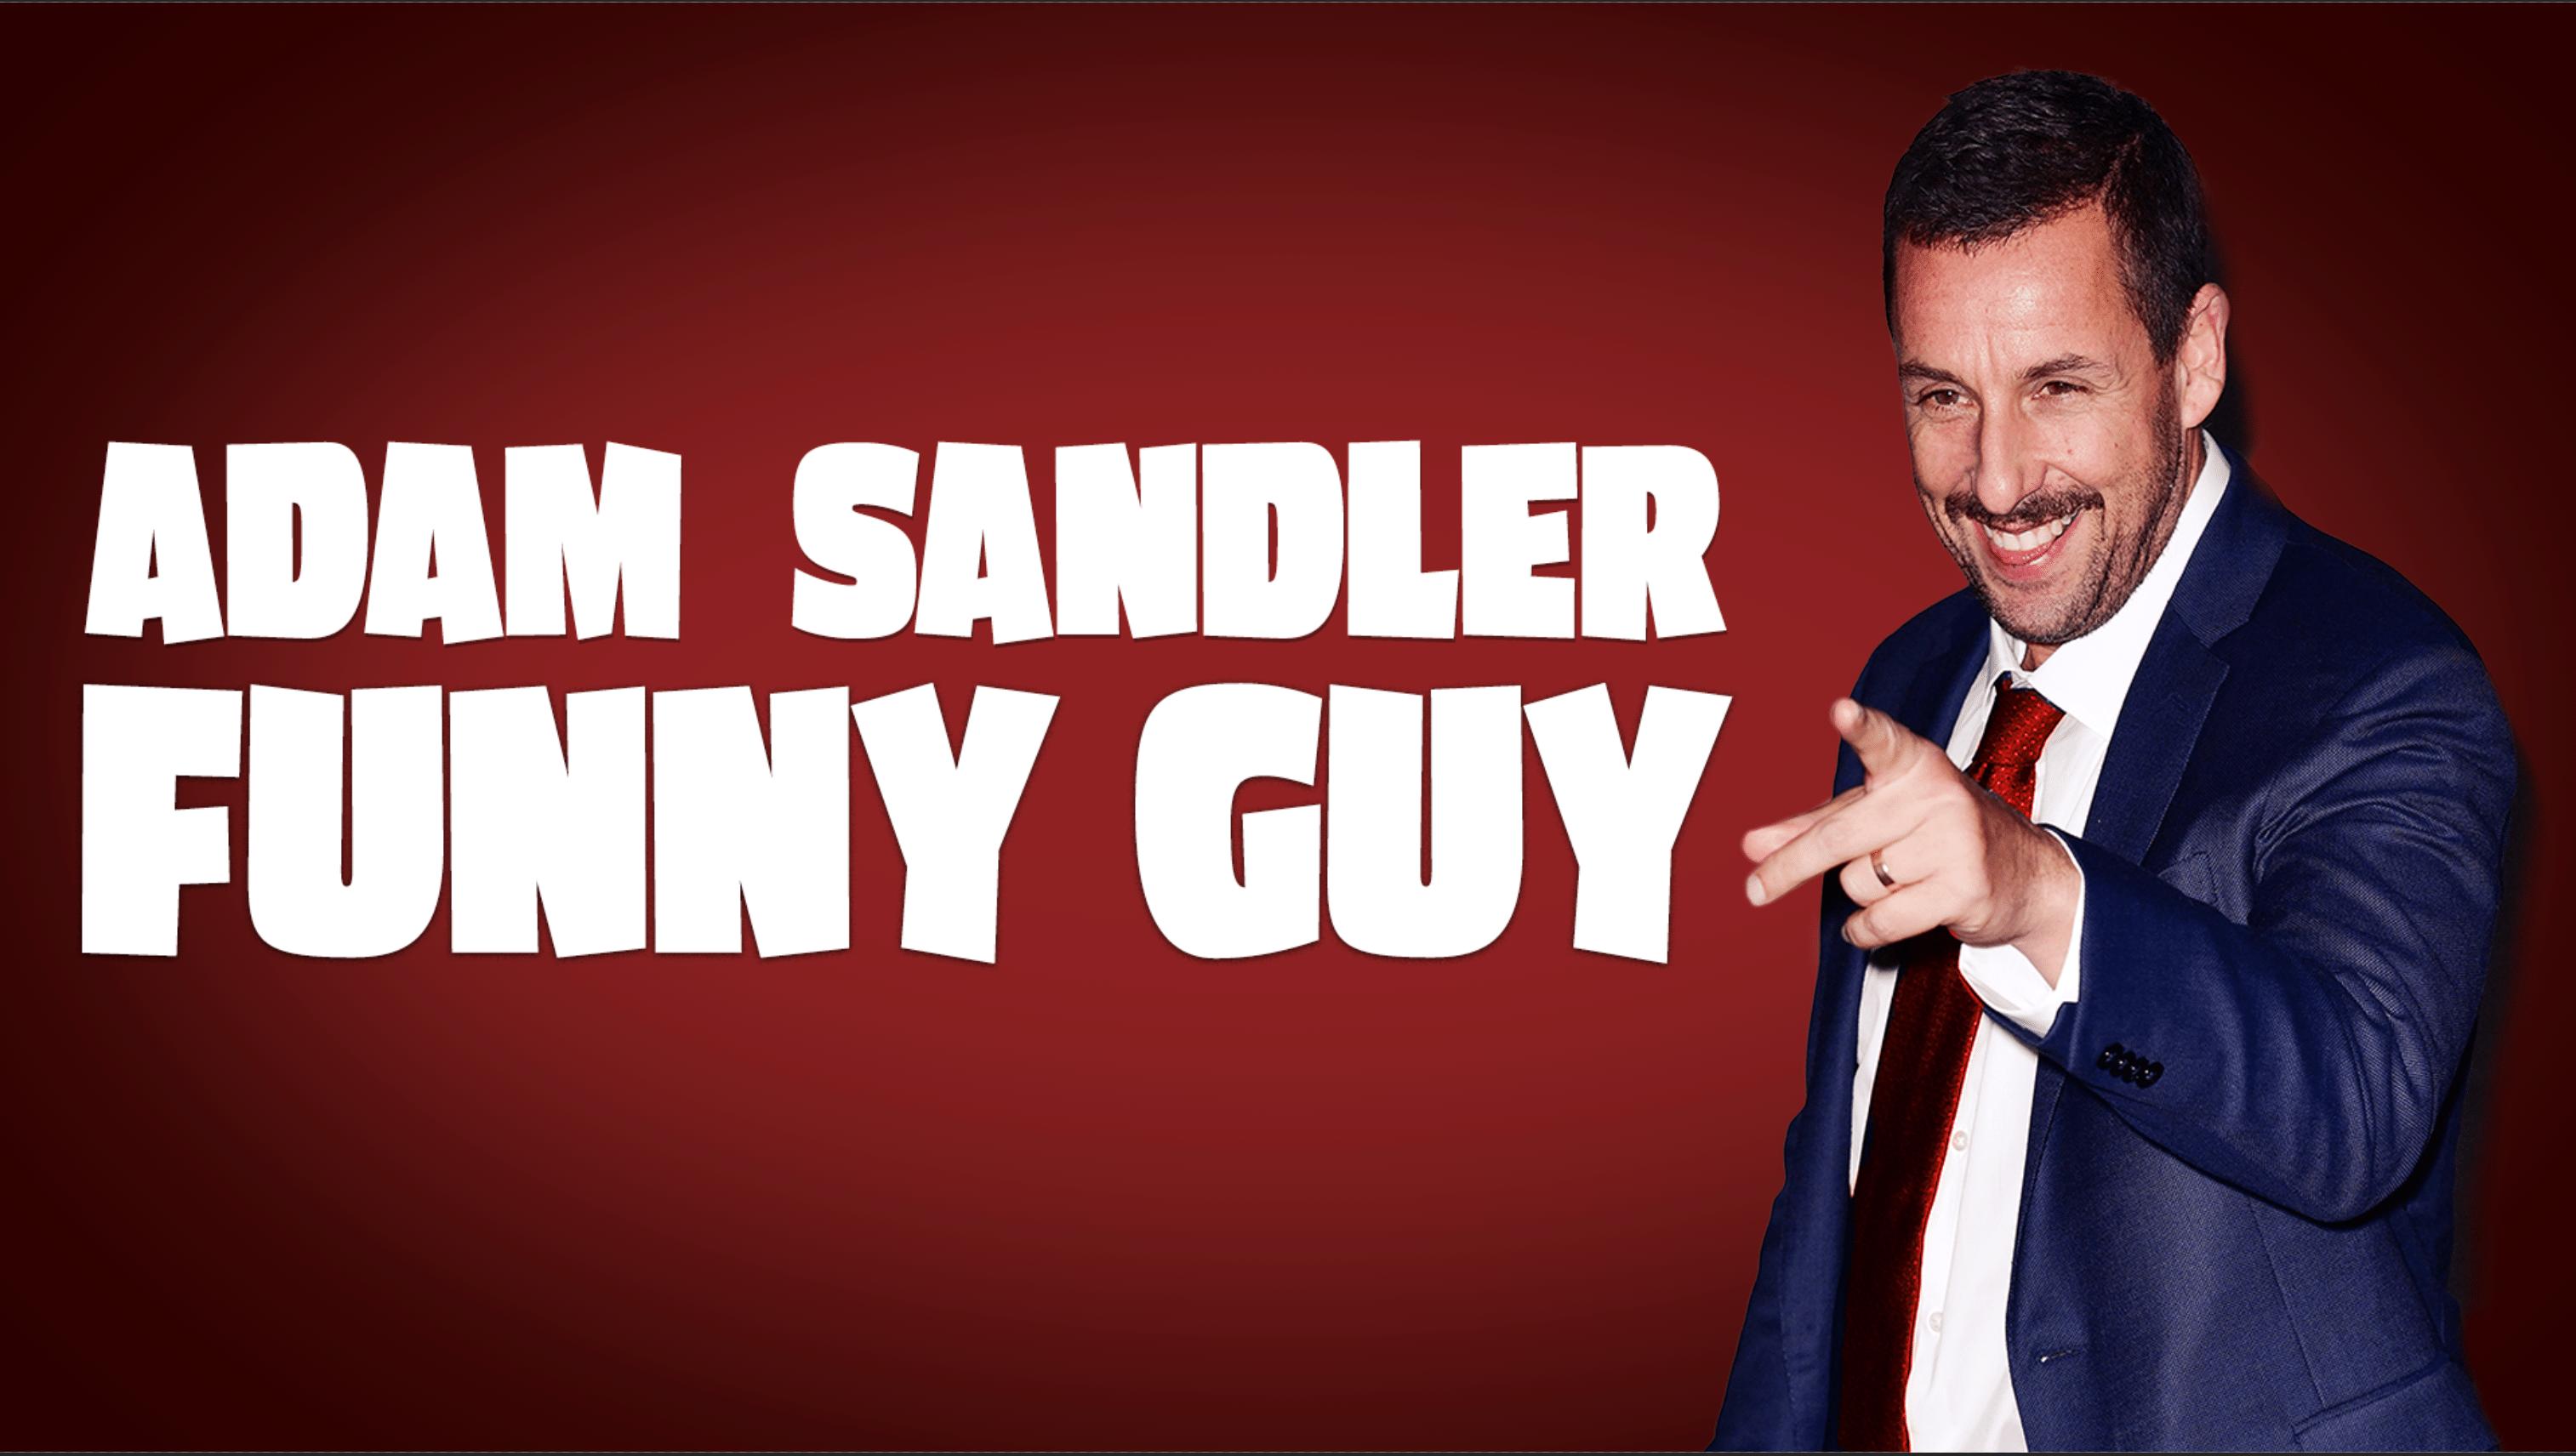 adam sandly funny guy december movie